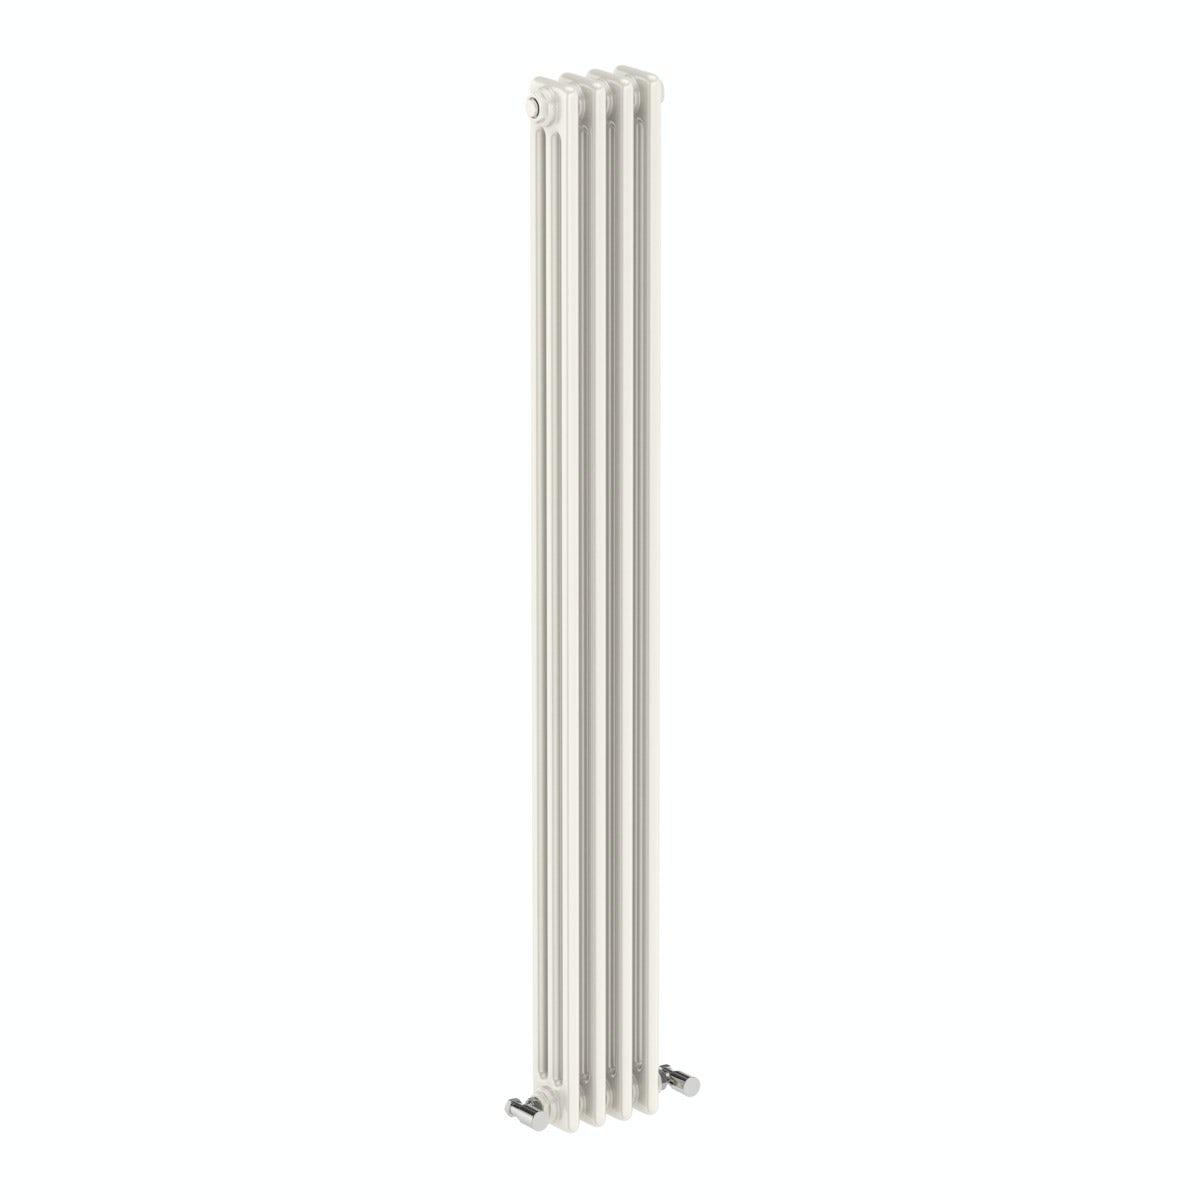 The Bath Co. Dulwich vertical white triple column radiator 1500 x 200